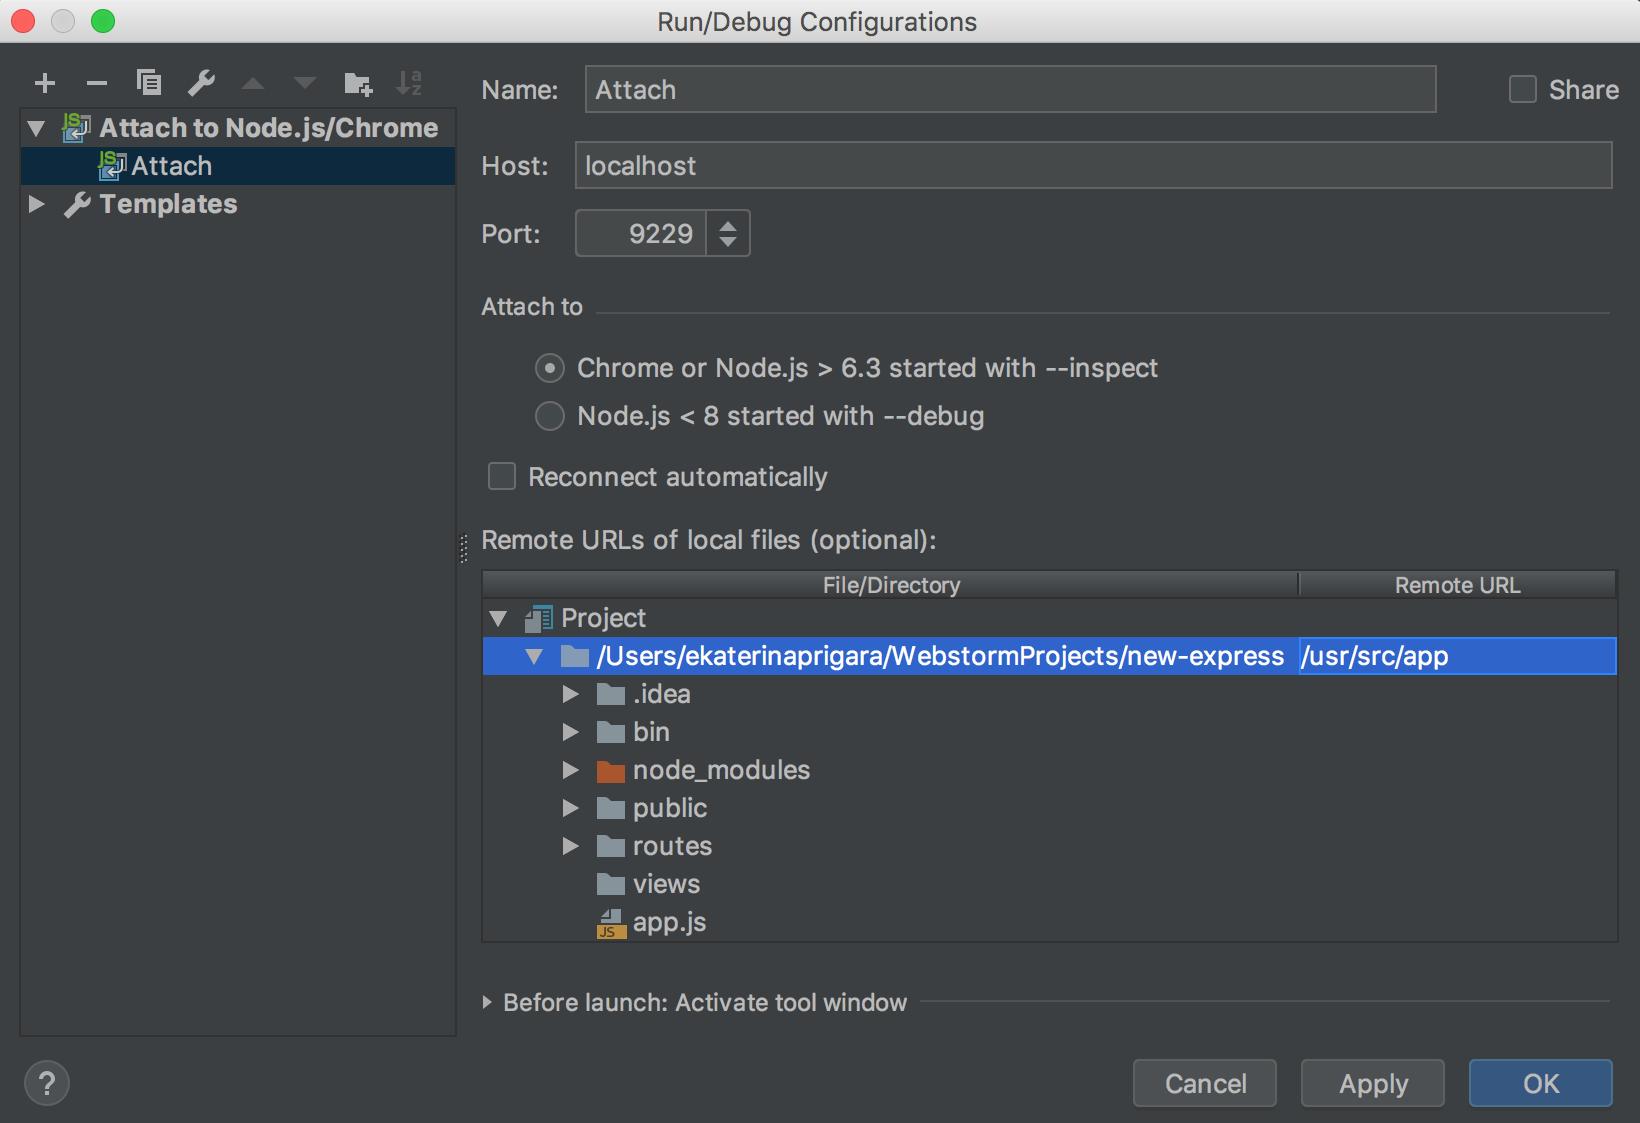 Specify Remote URLs of local files